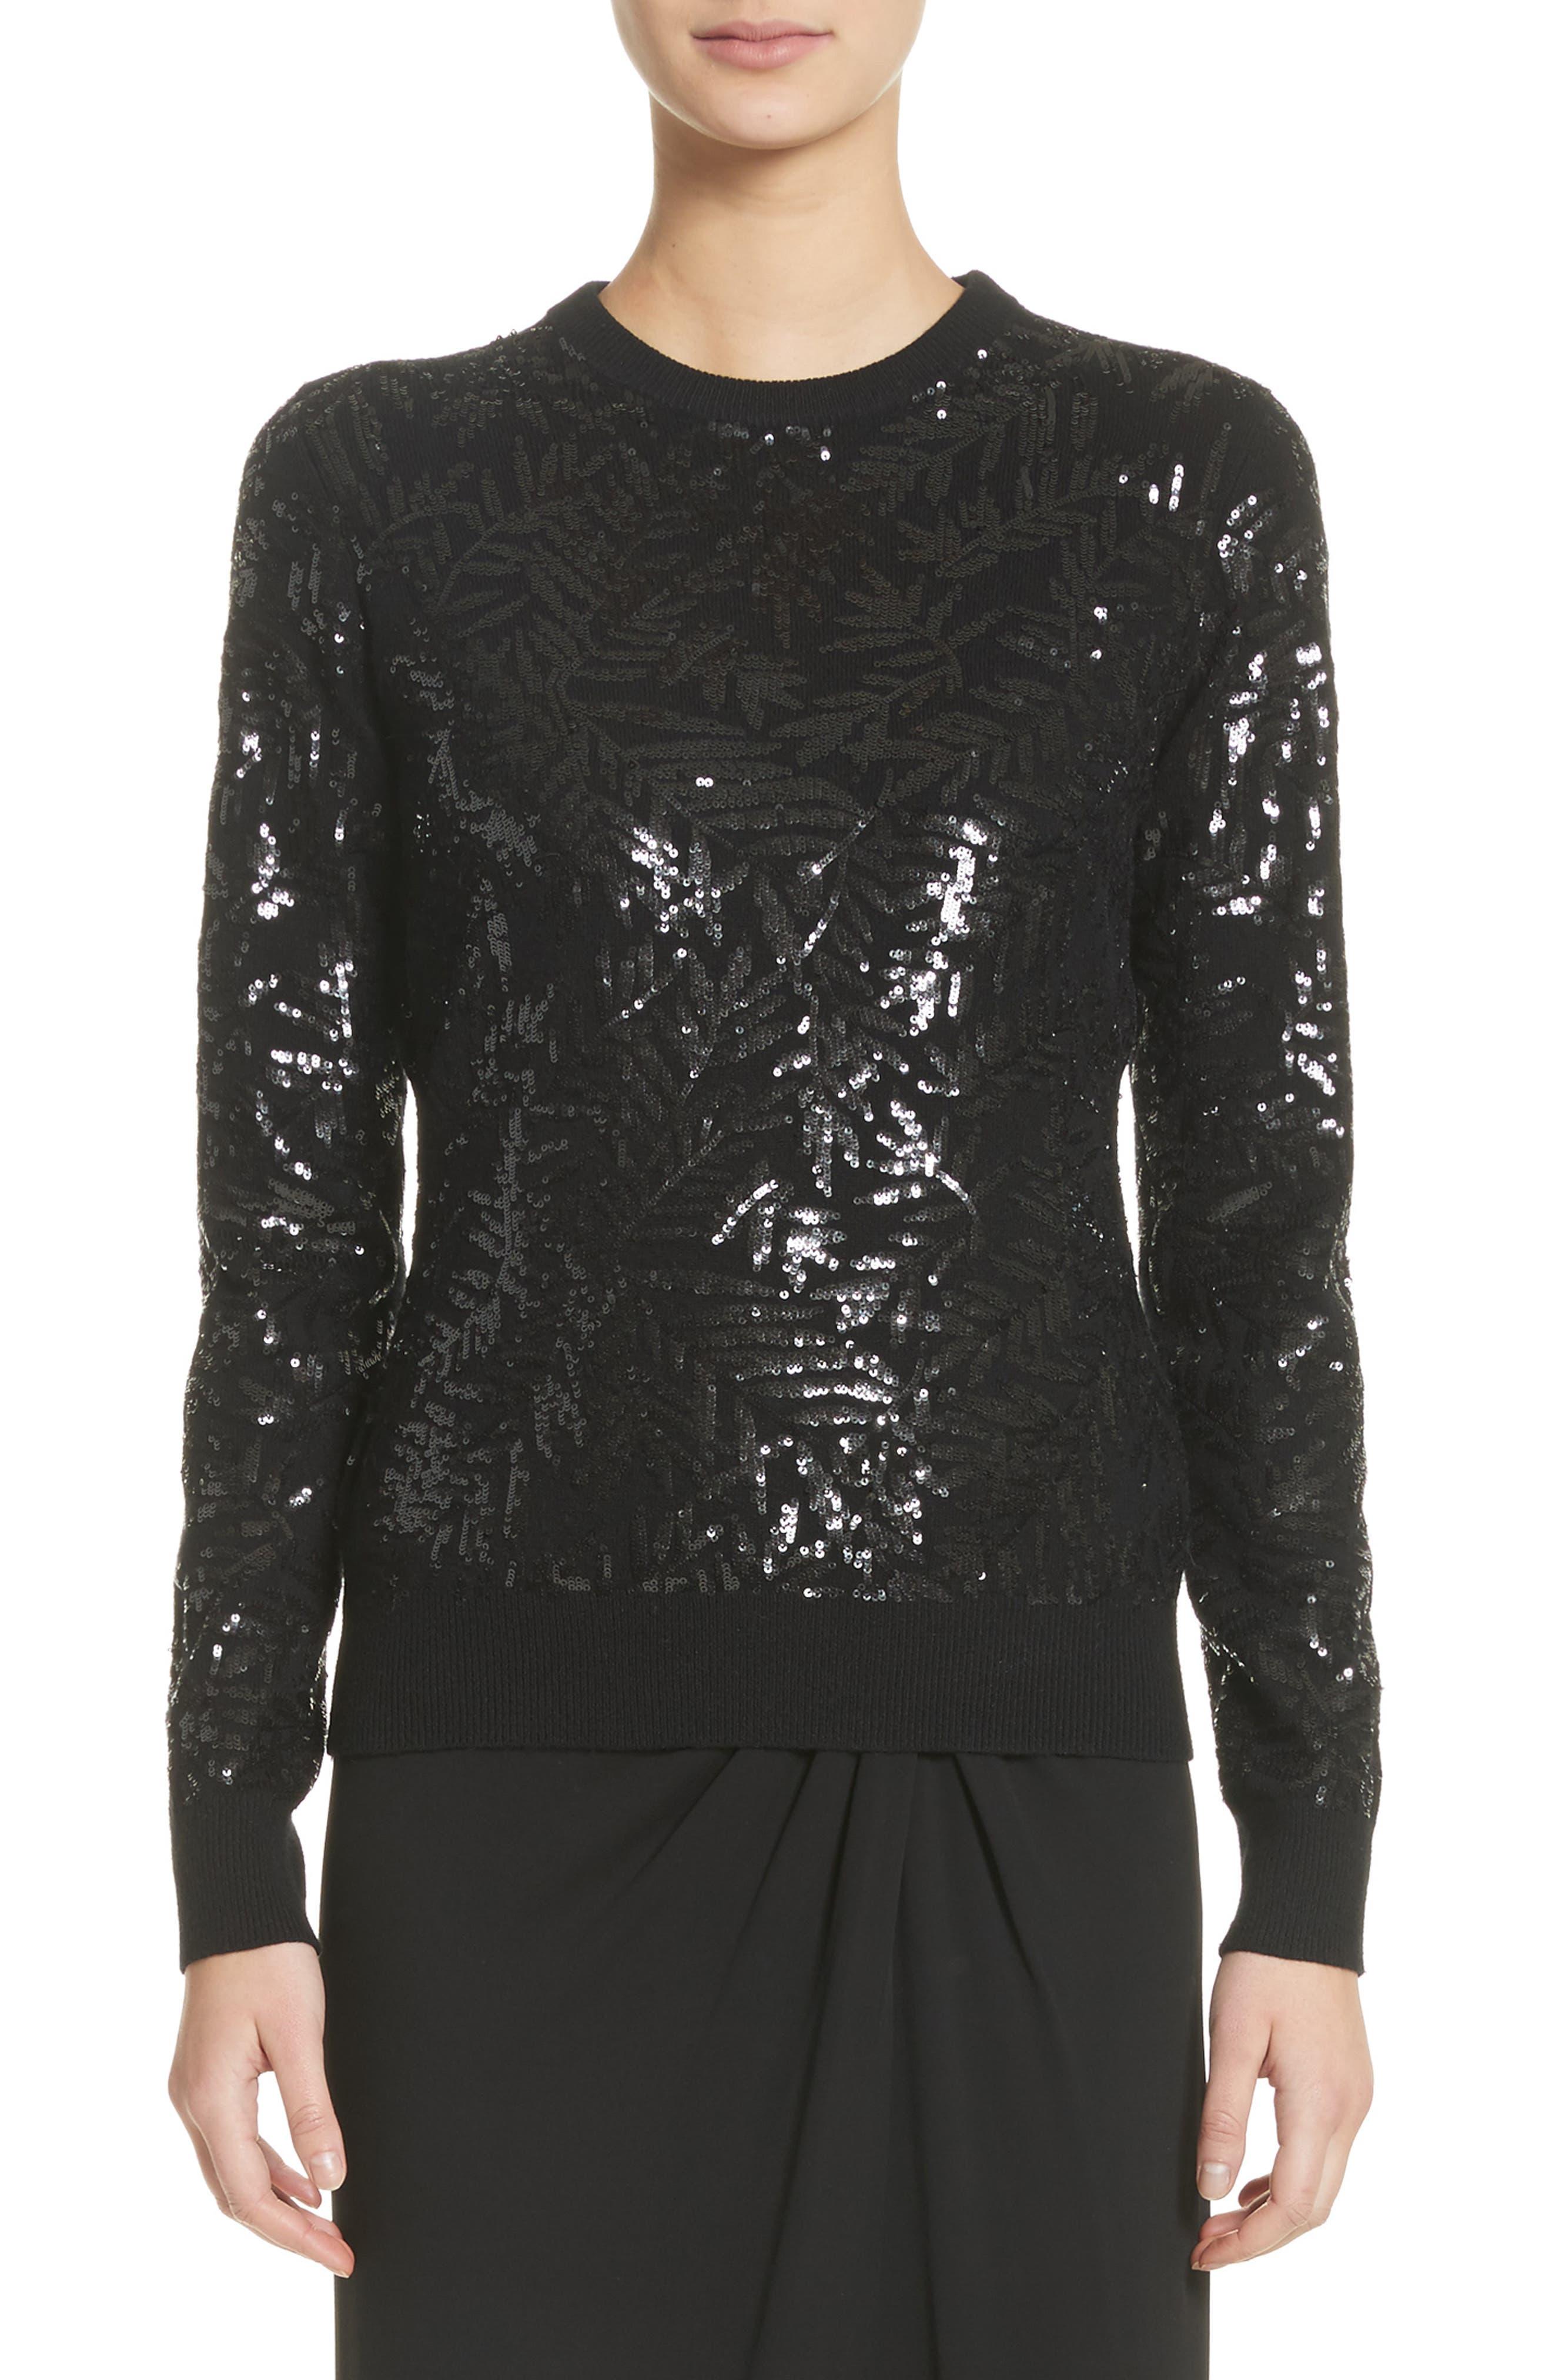 Michael Kors Sequin Palm Cashmere Sweater